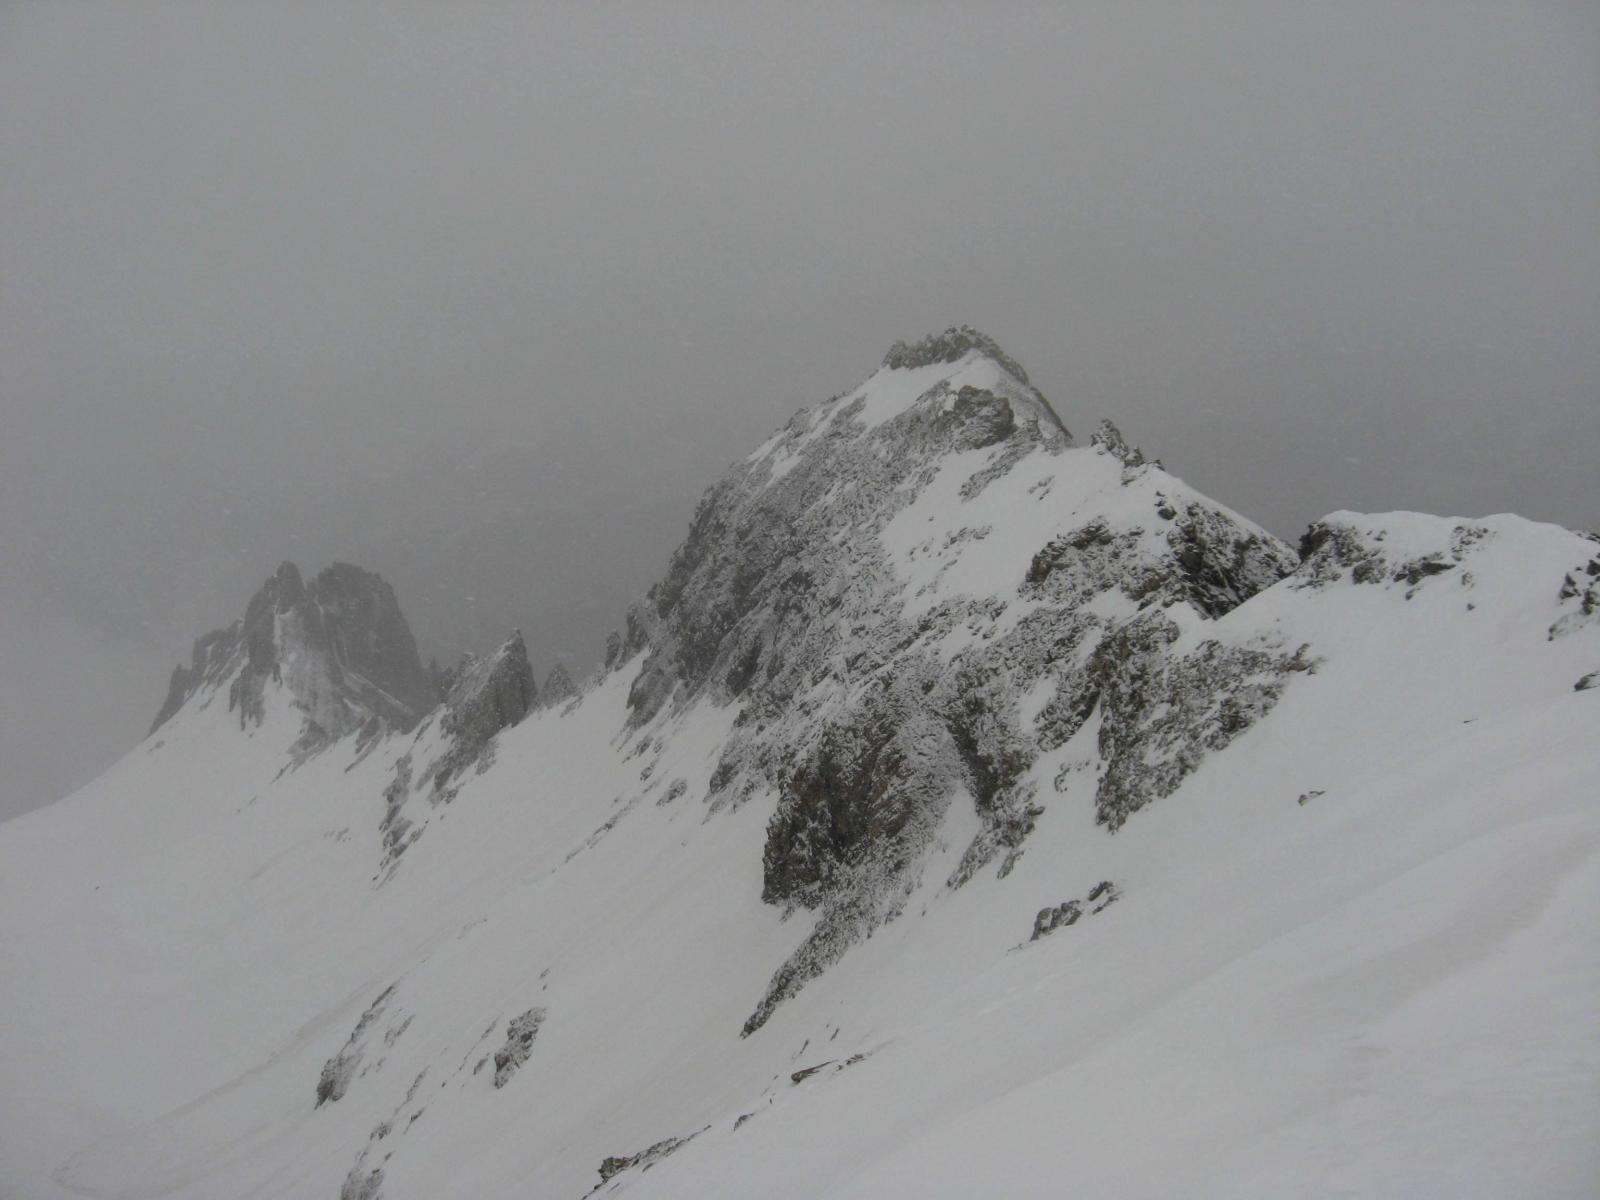 Cresta tra Vallone/Vallonet